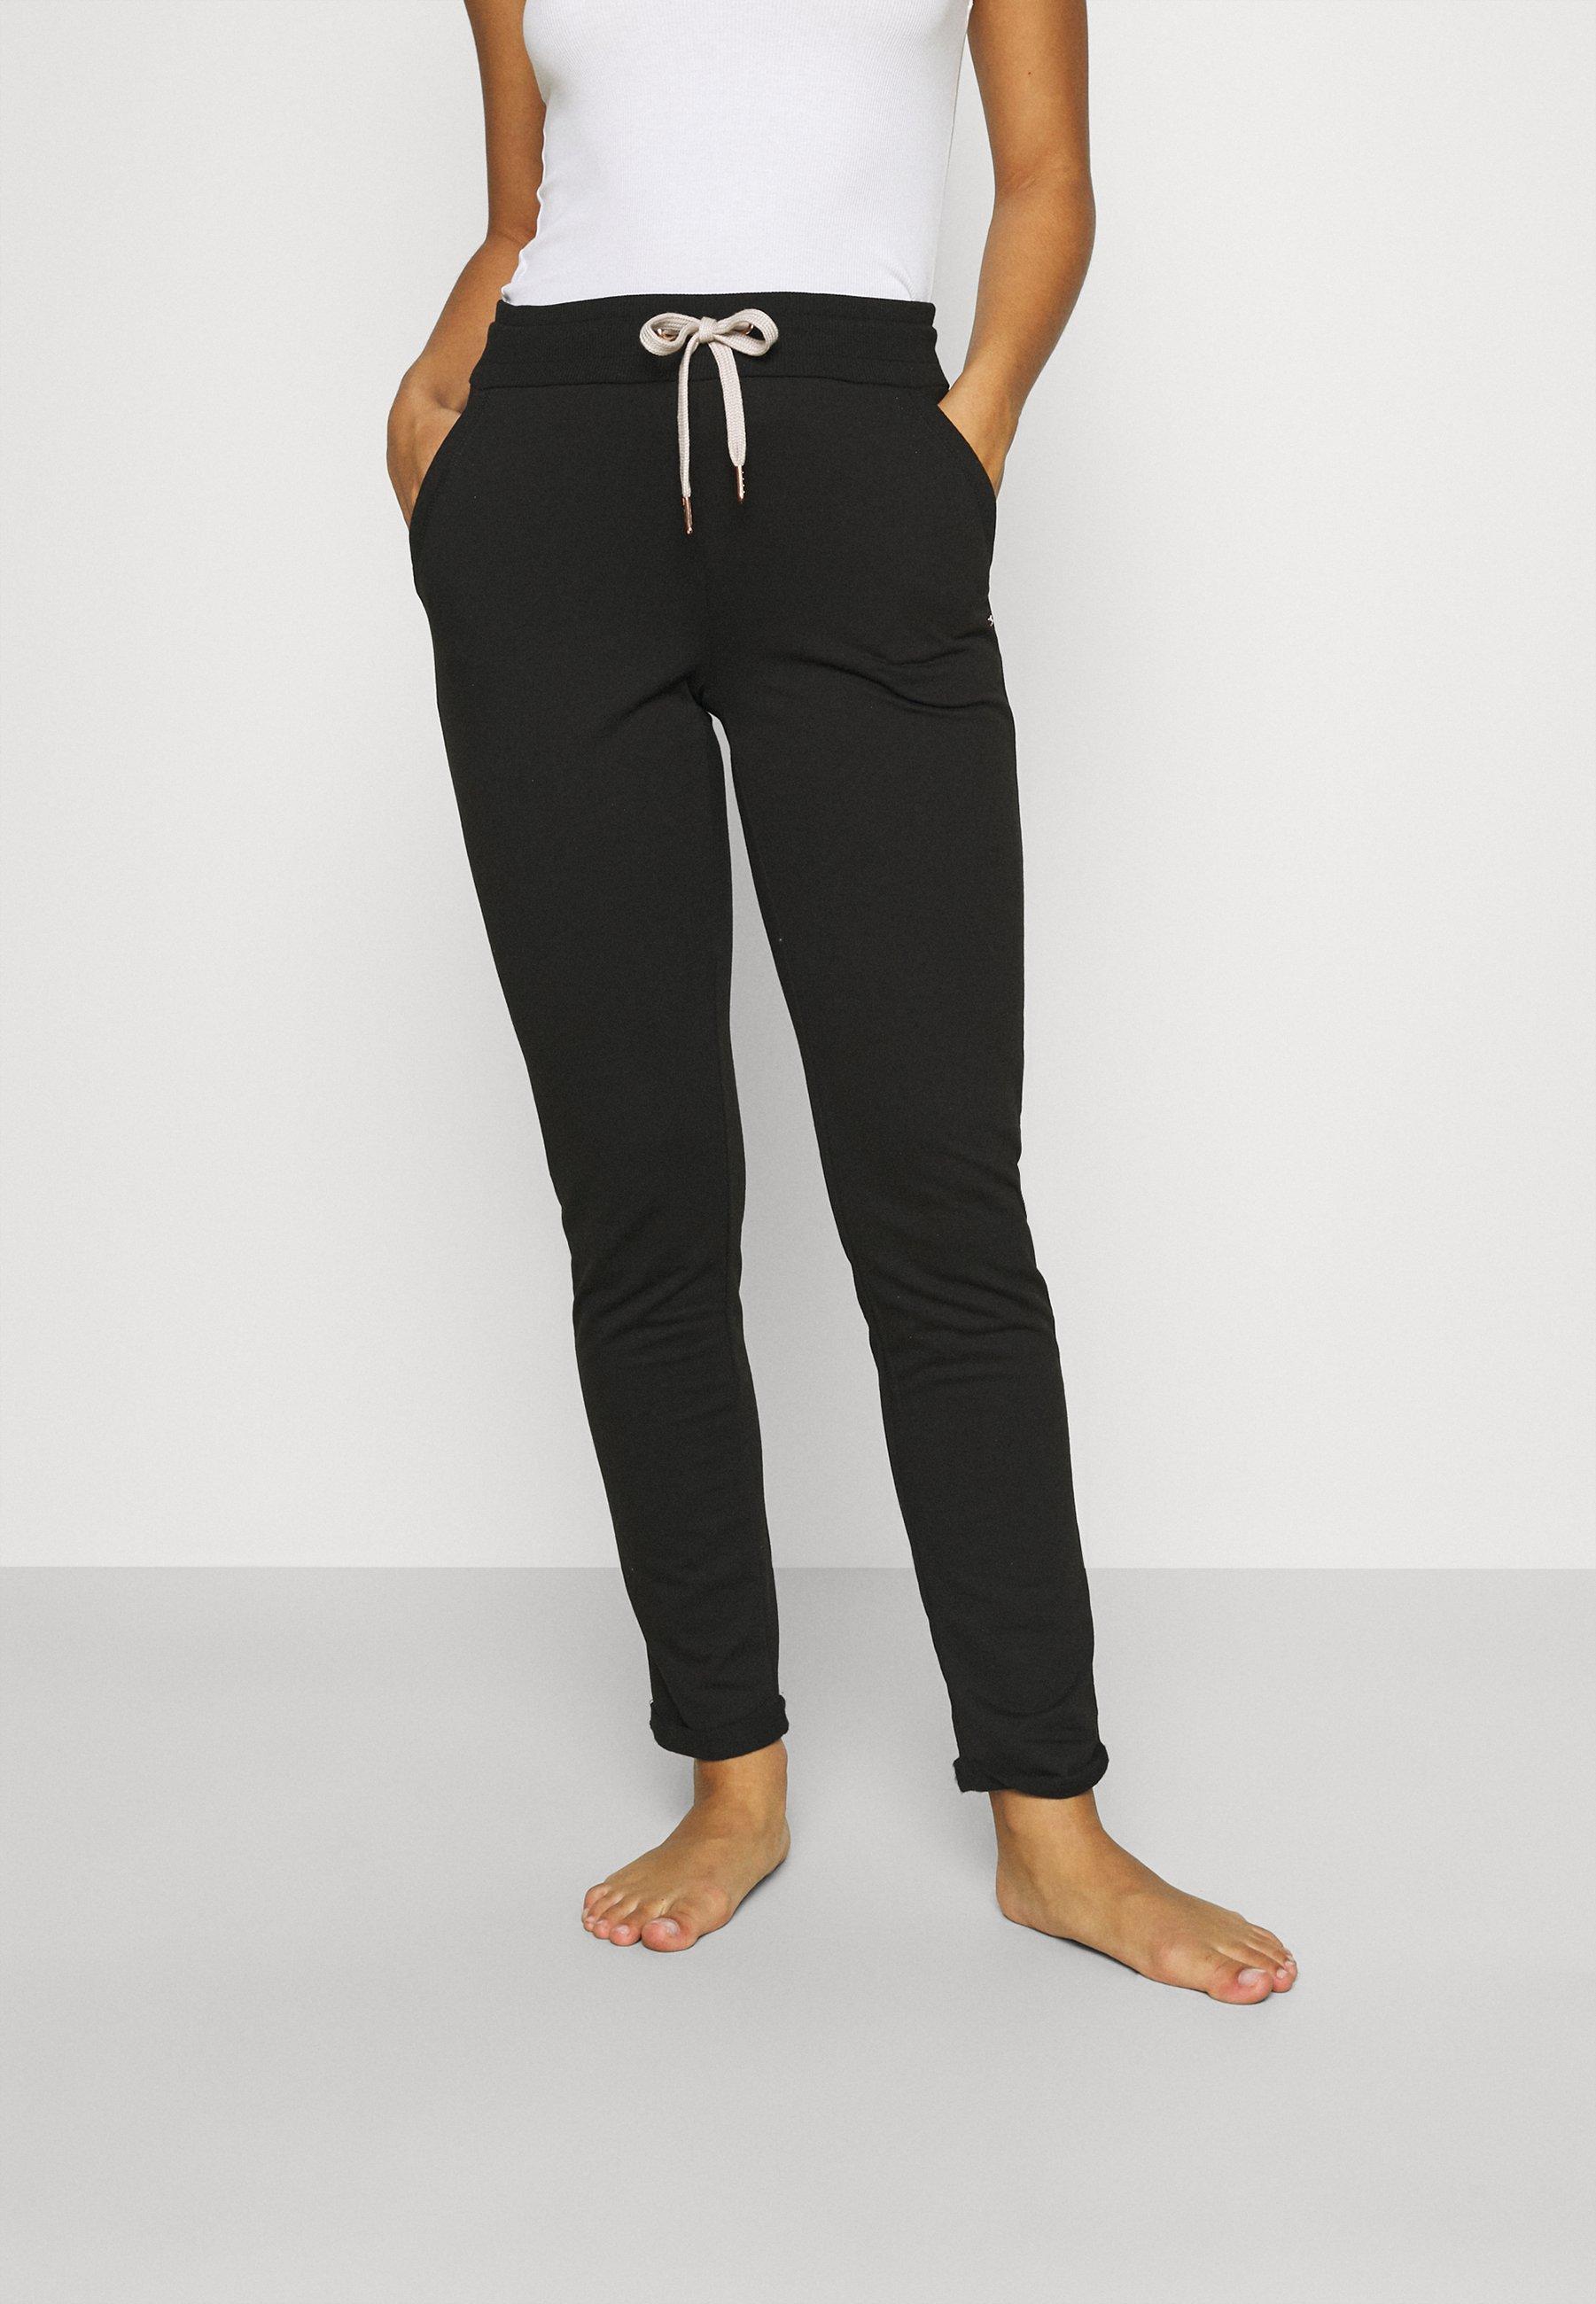 Damen PANTS - Nachtwäsche Hose